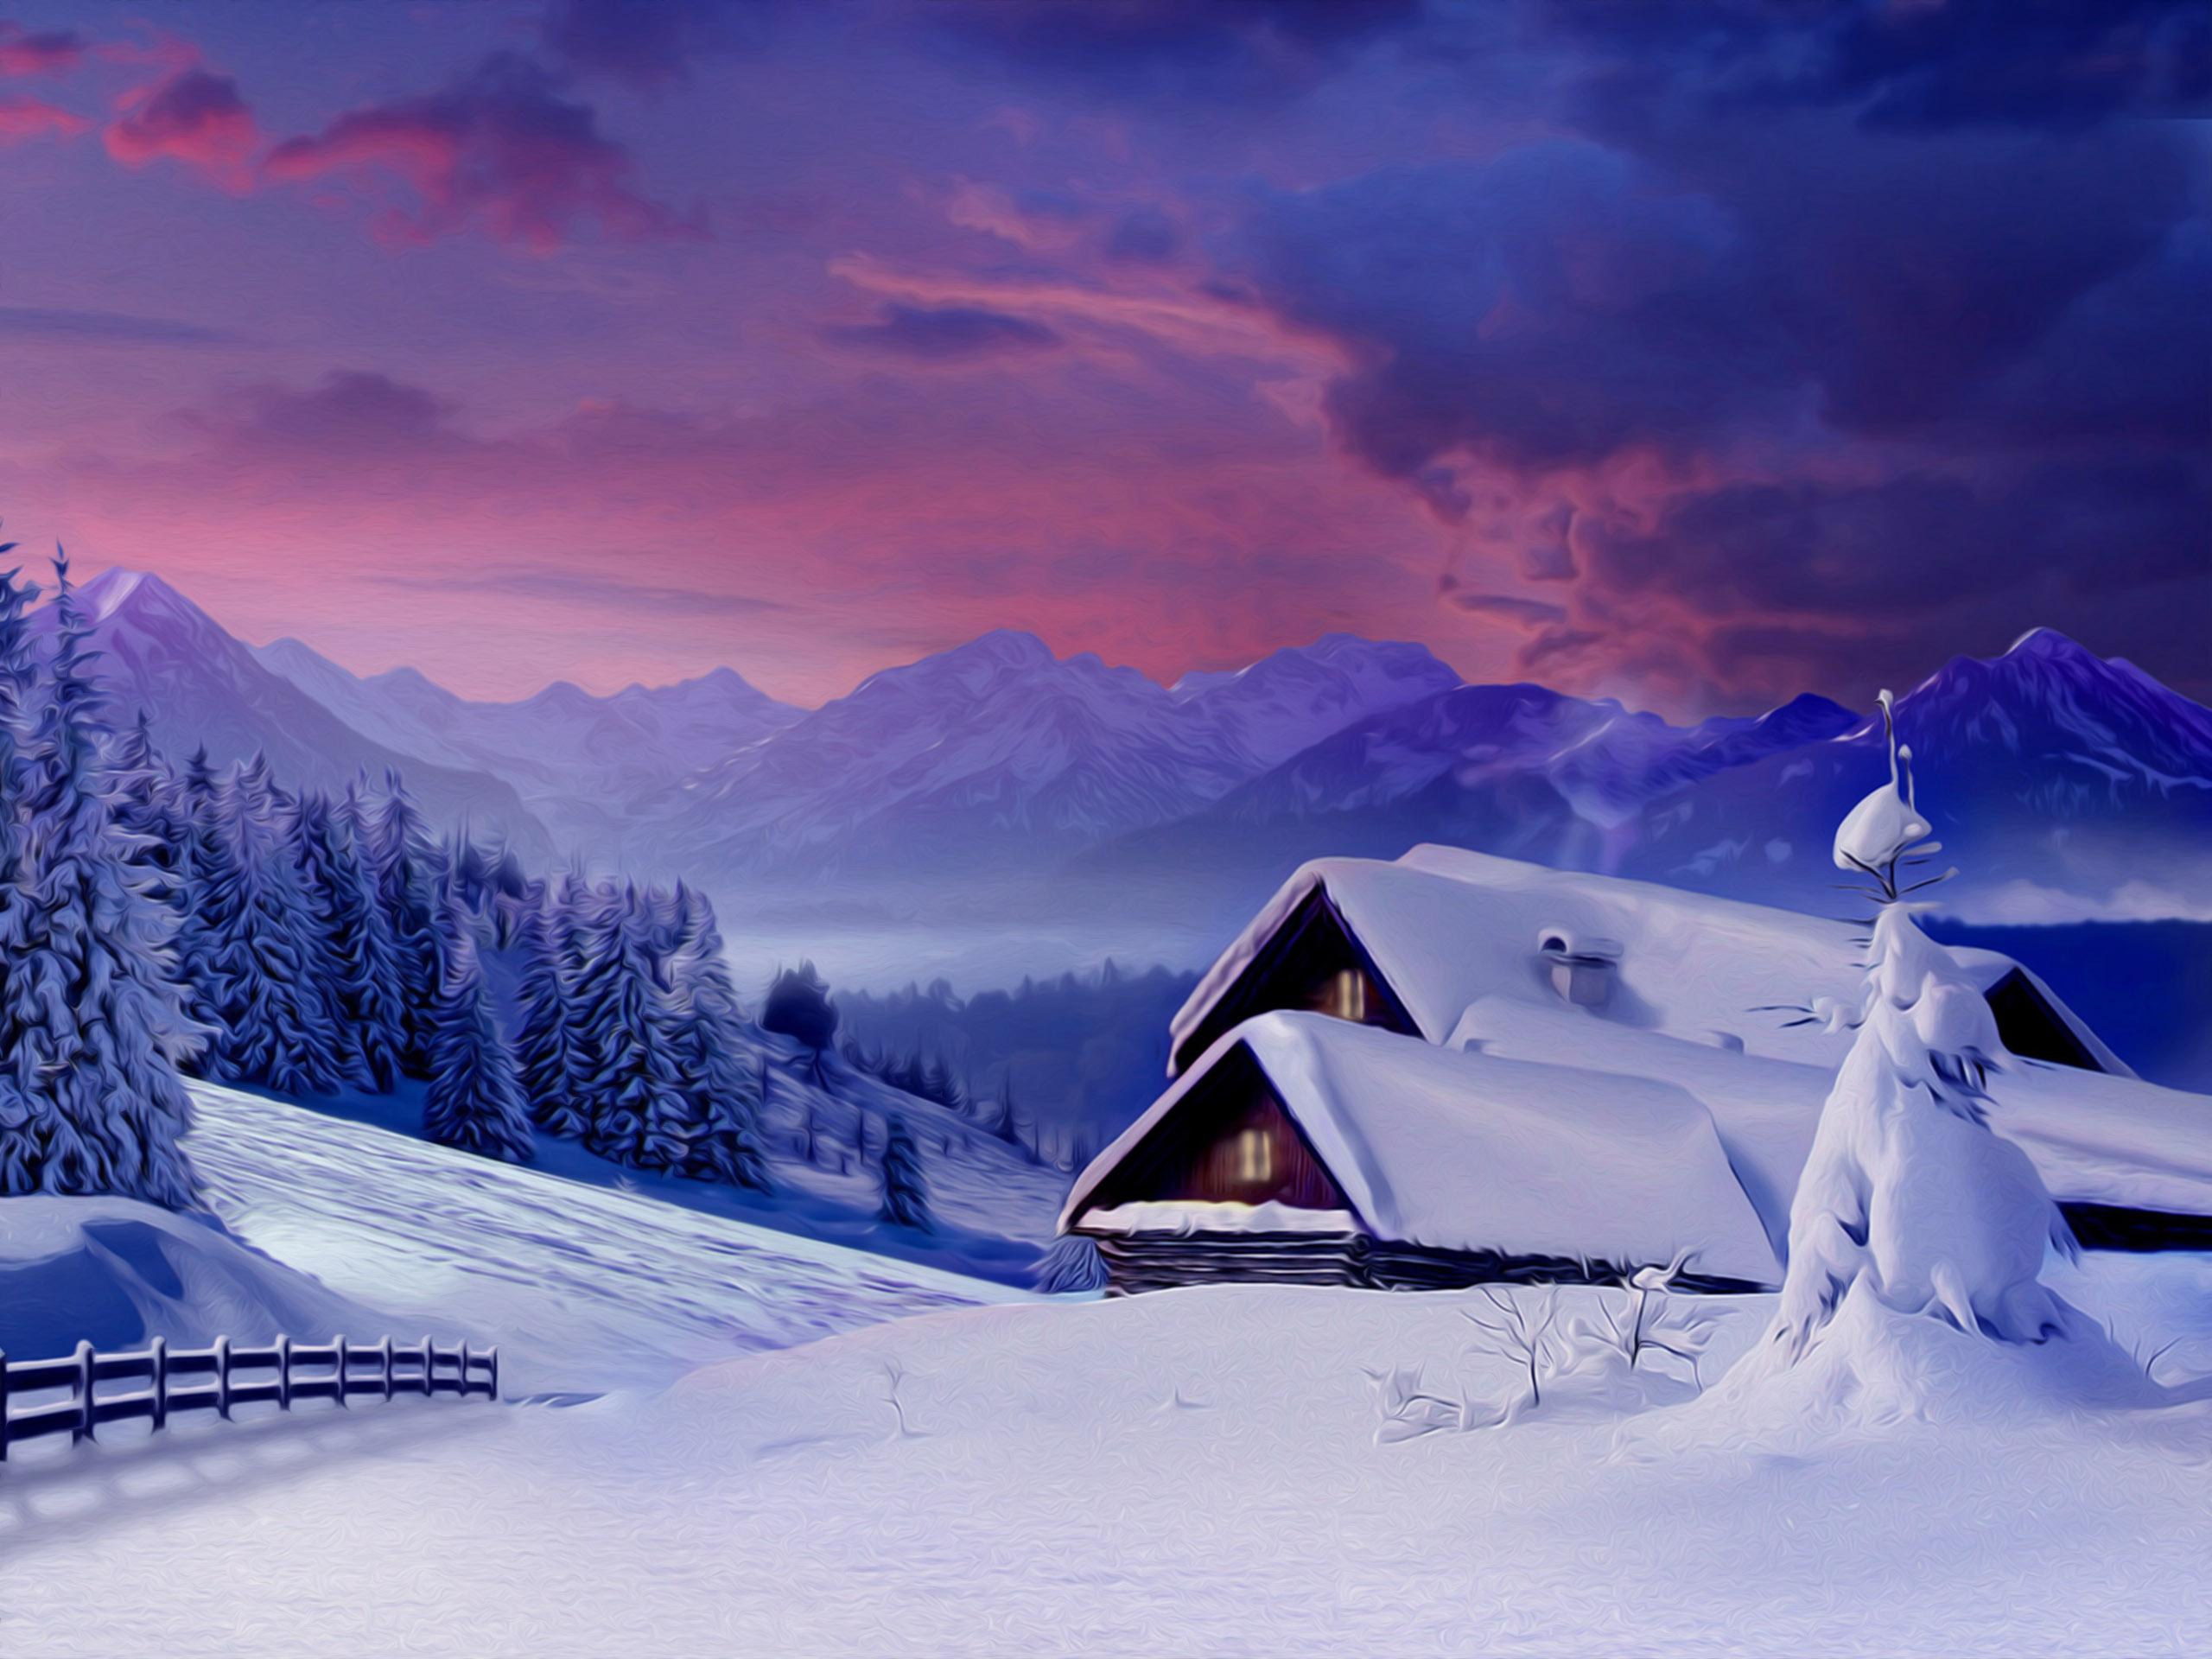 inspiritoocomsource url hdwallpaperstop category snow winterhtml 2560x1920